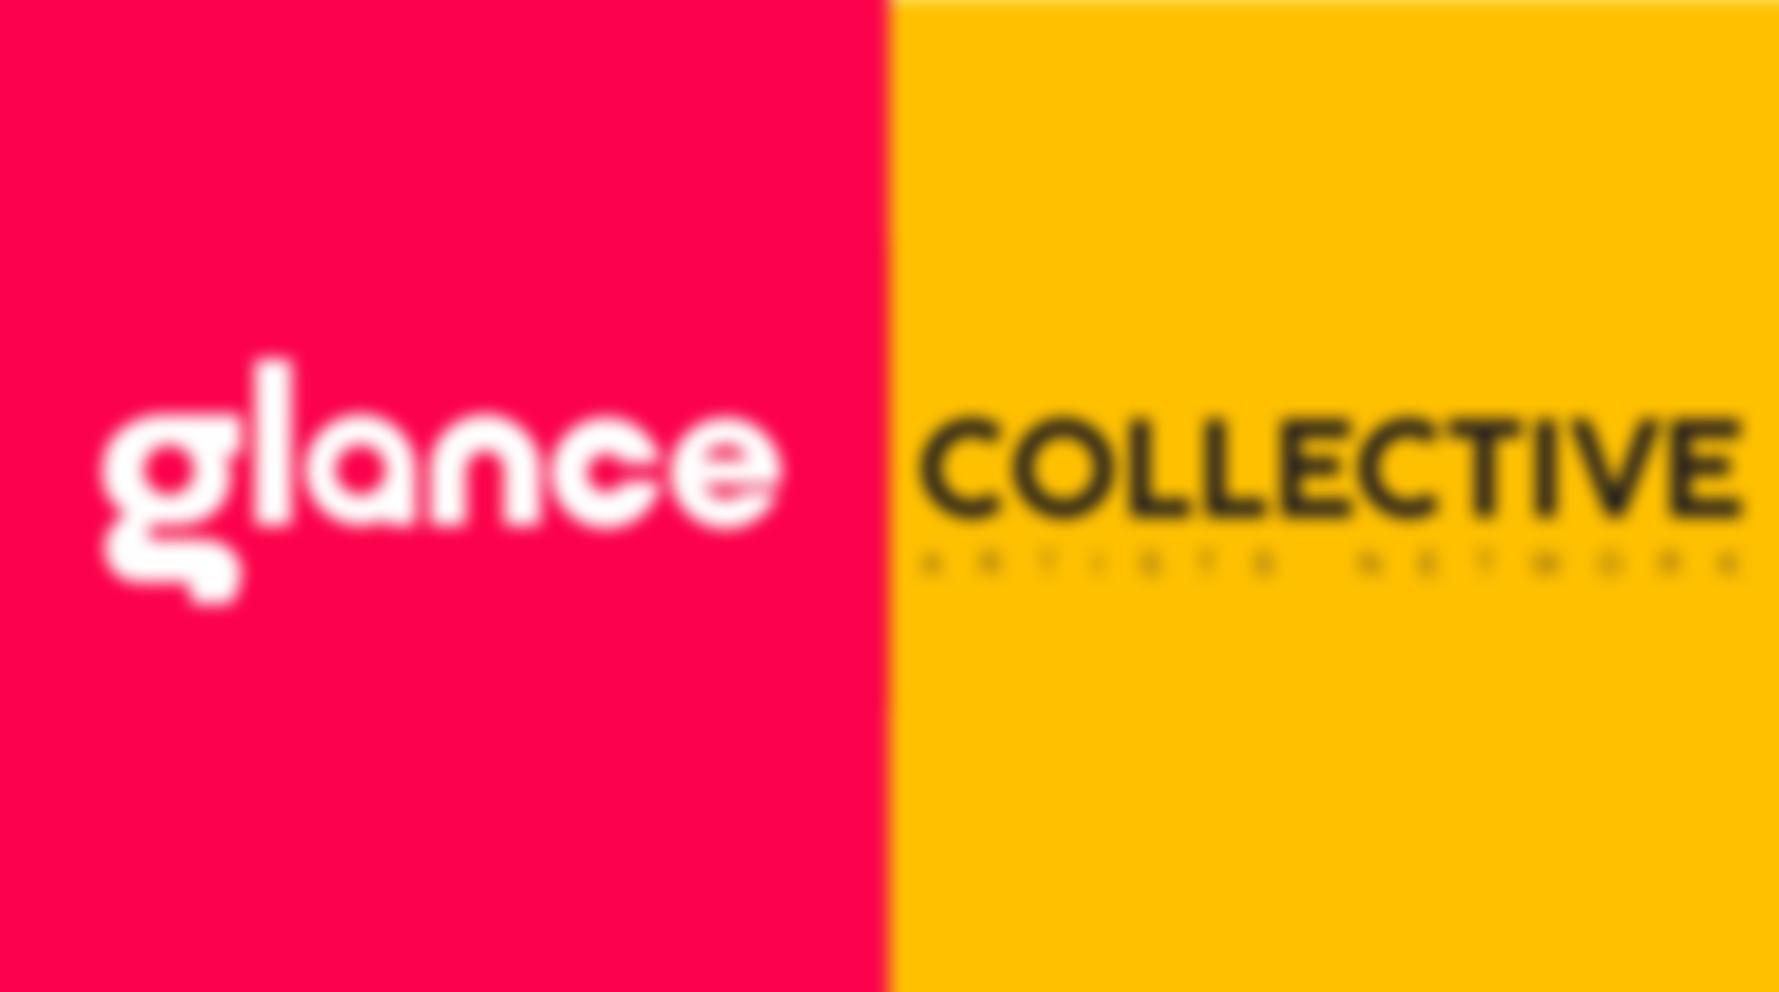 glance collective